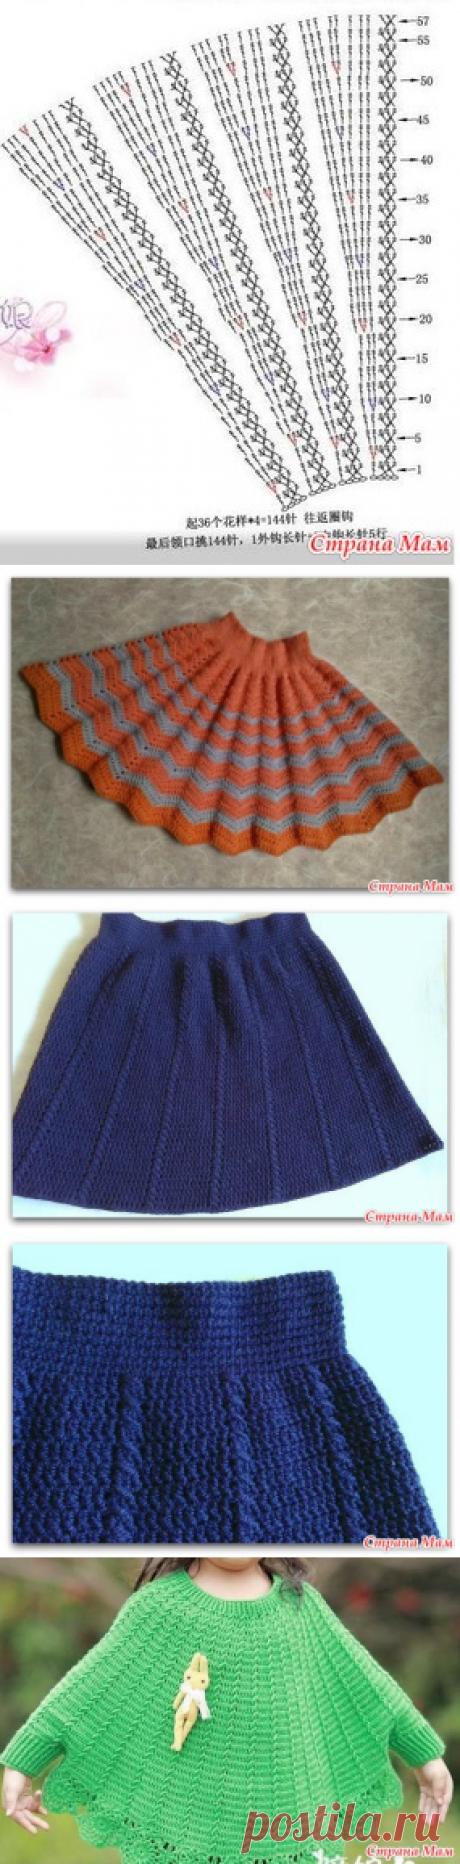 юбочки для внучки - Вязание - Страна Мам